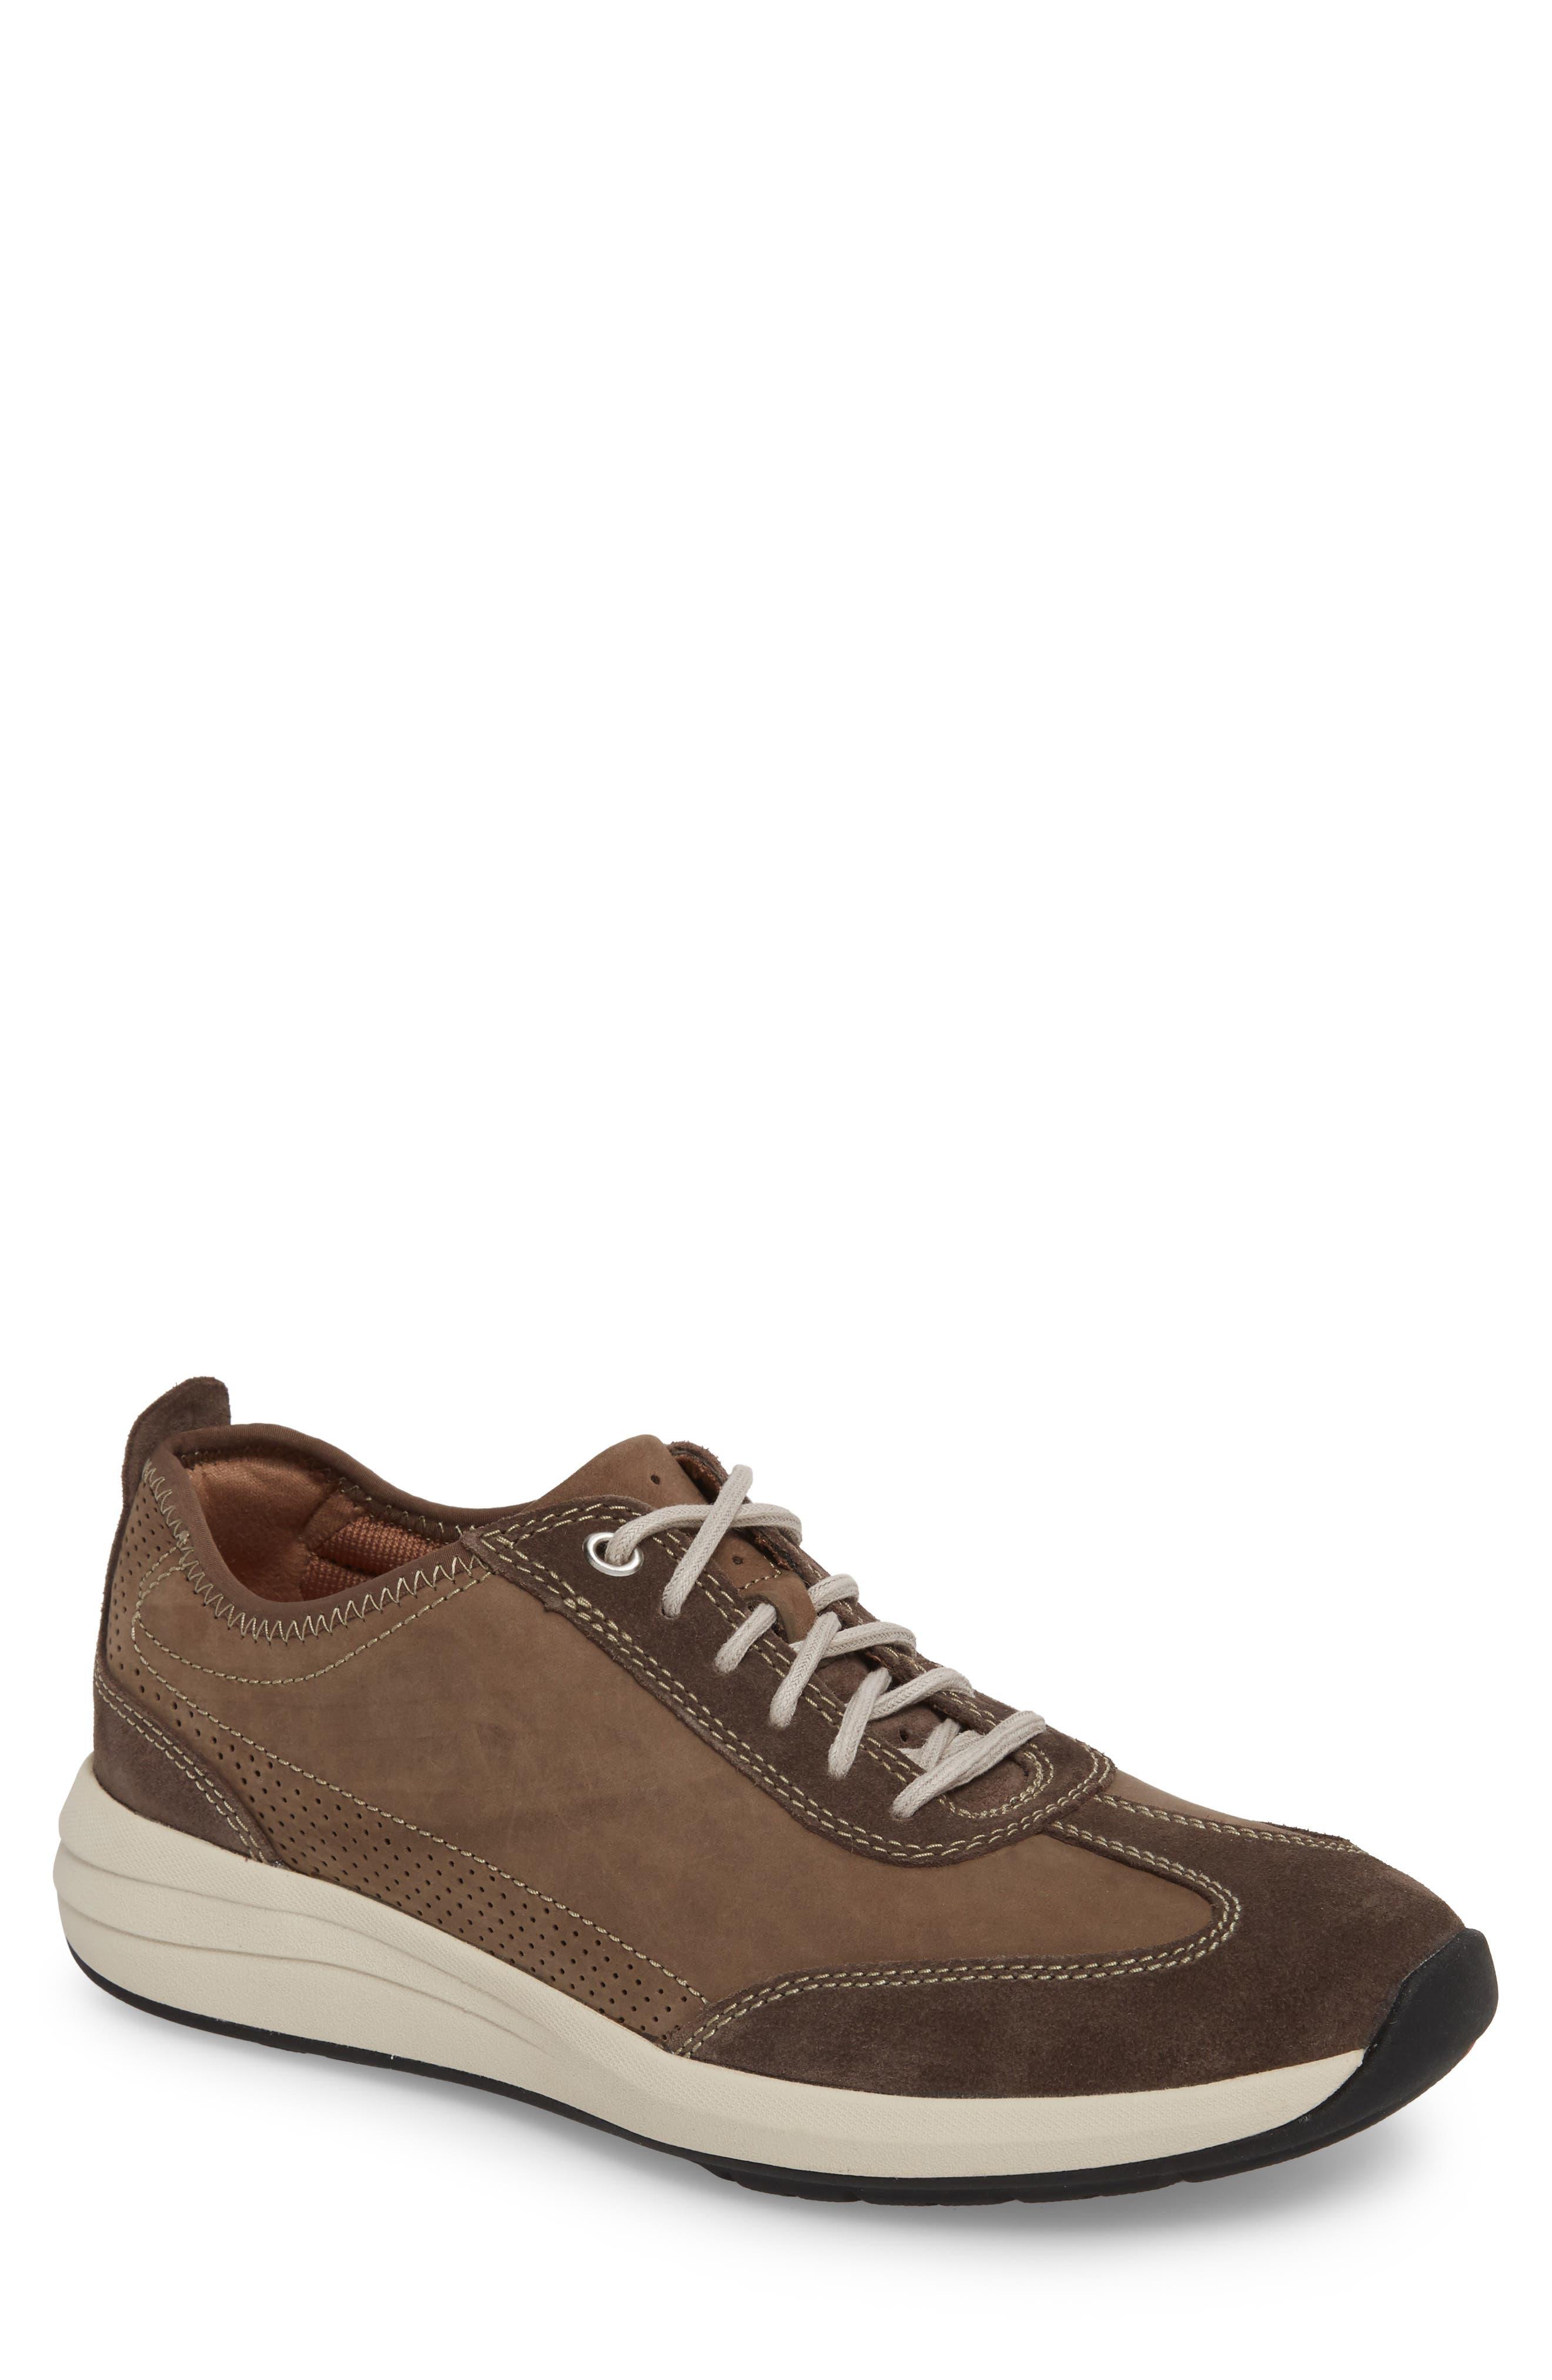 Clarks<sup>®</sup> Un Coast Low Top Sneaker,                             Main thumbnail 1, color,                             Taupe Nubuck